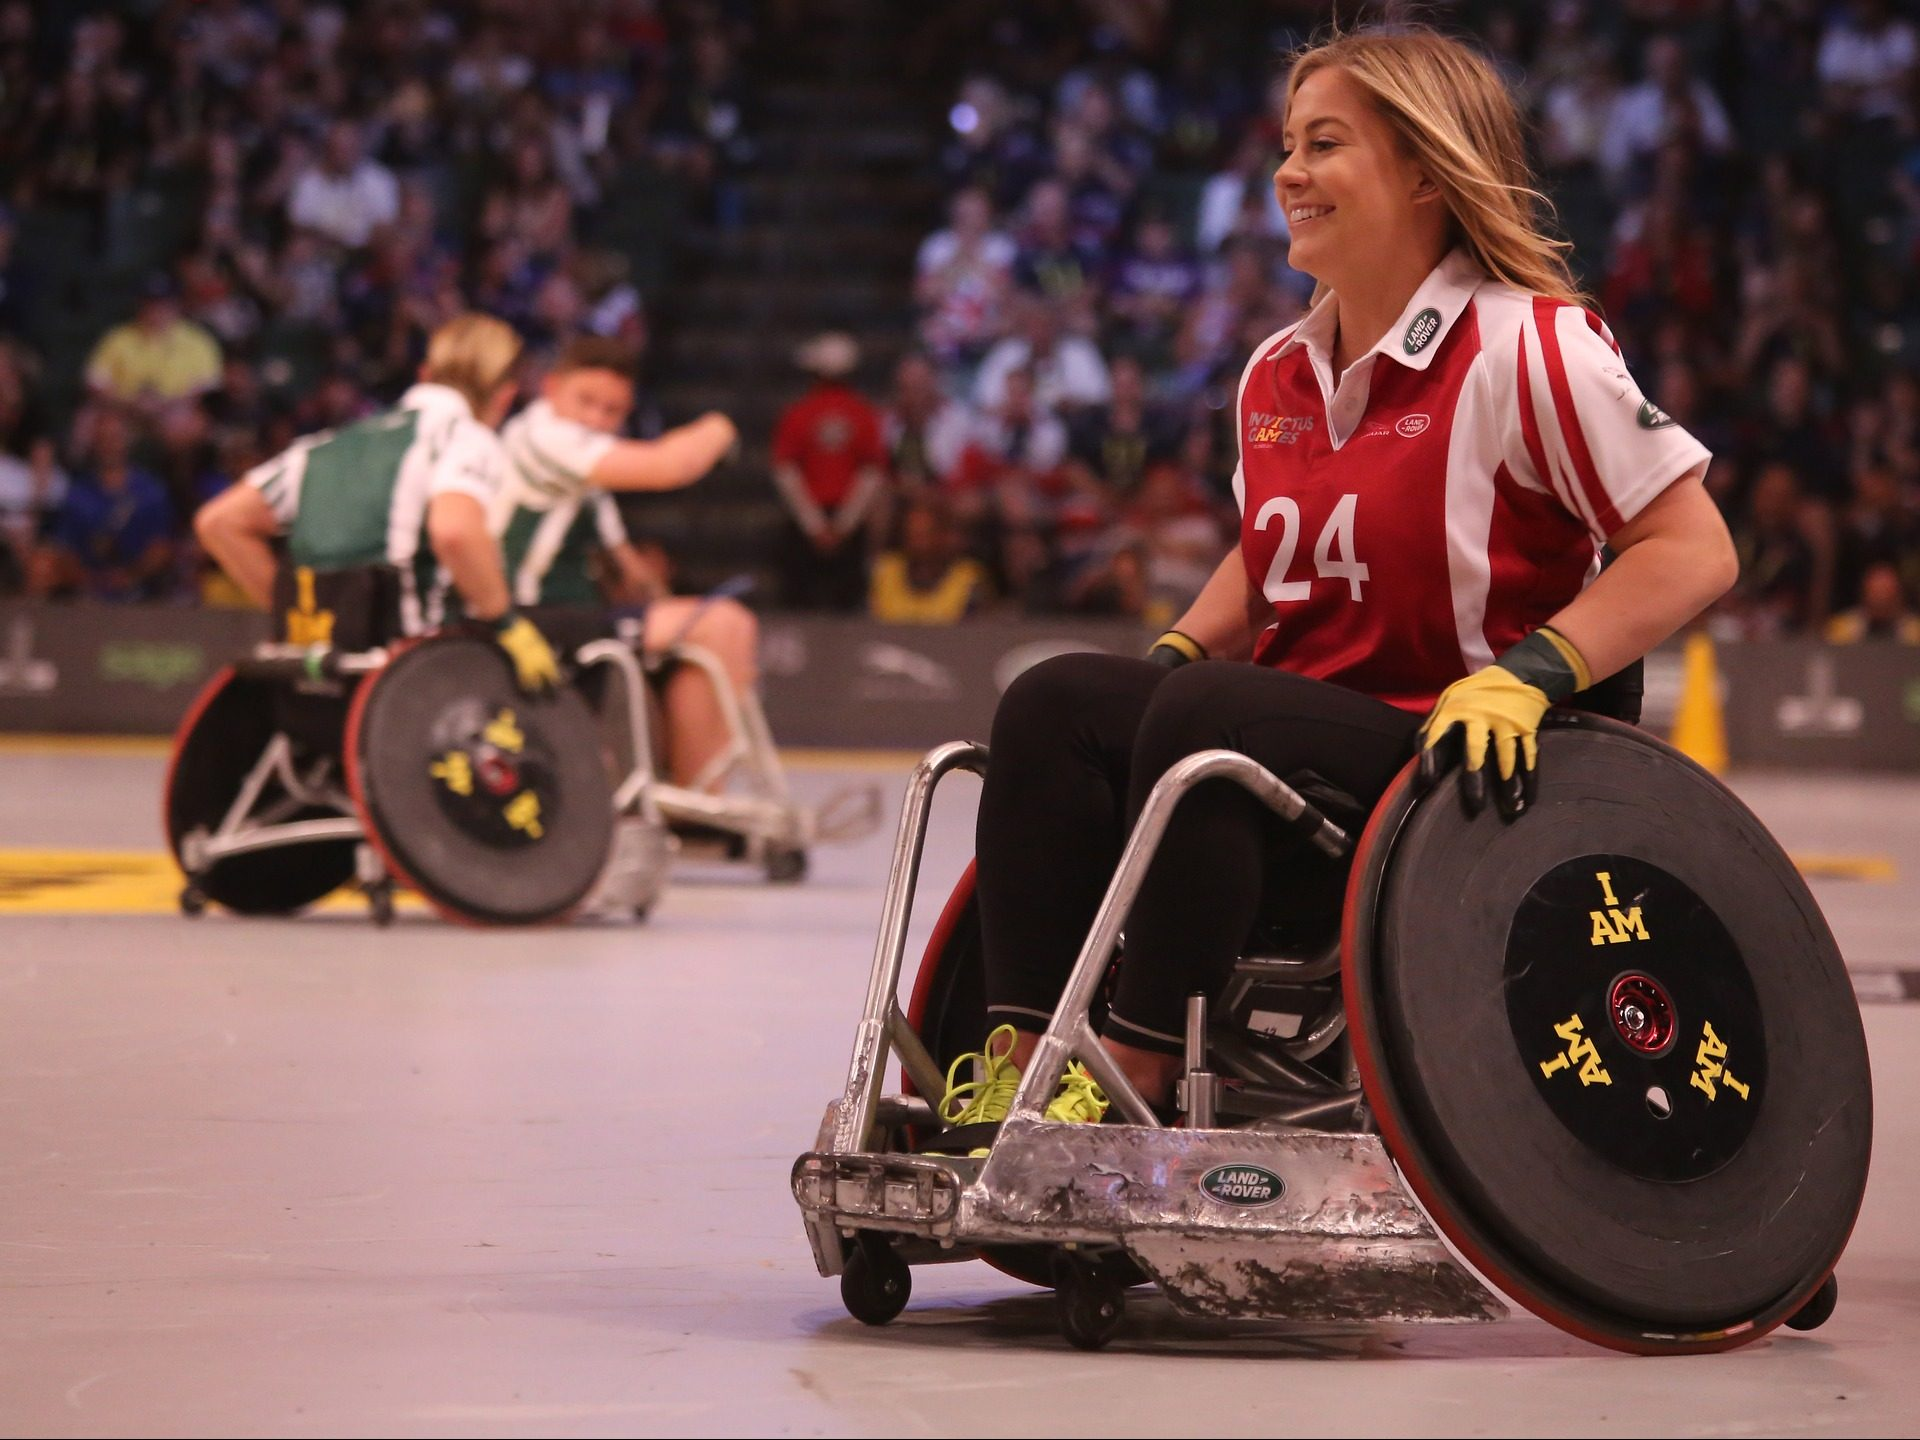 Wheelchair Basketball athlete during basketball game